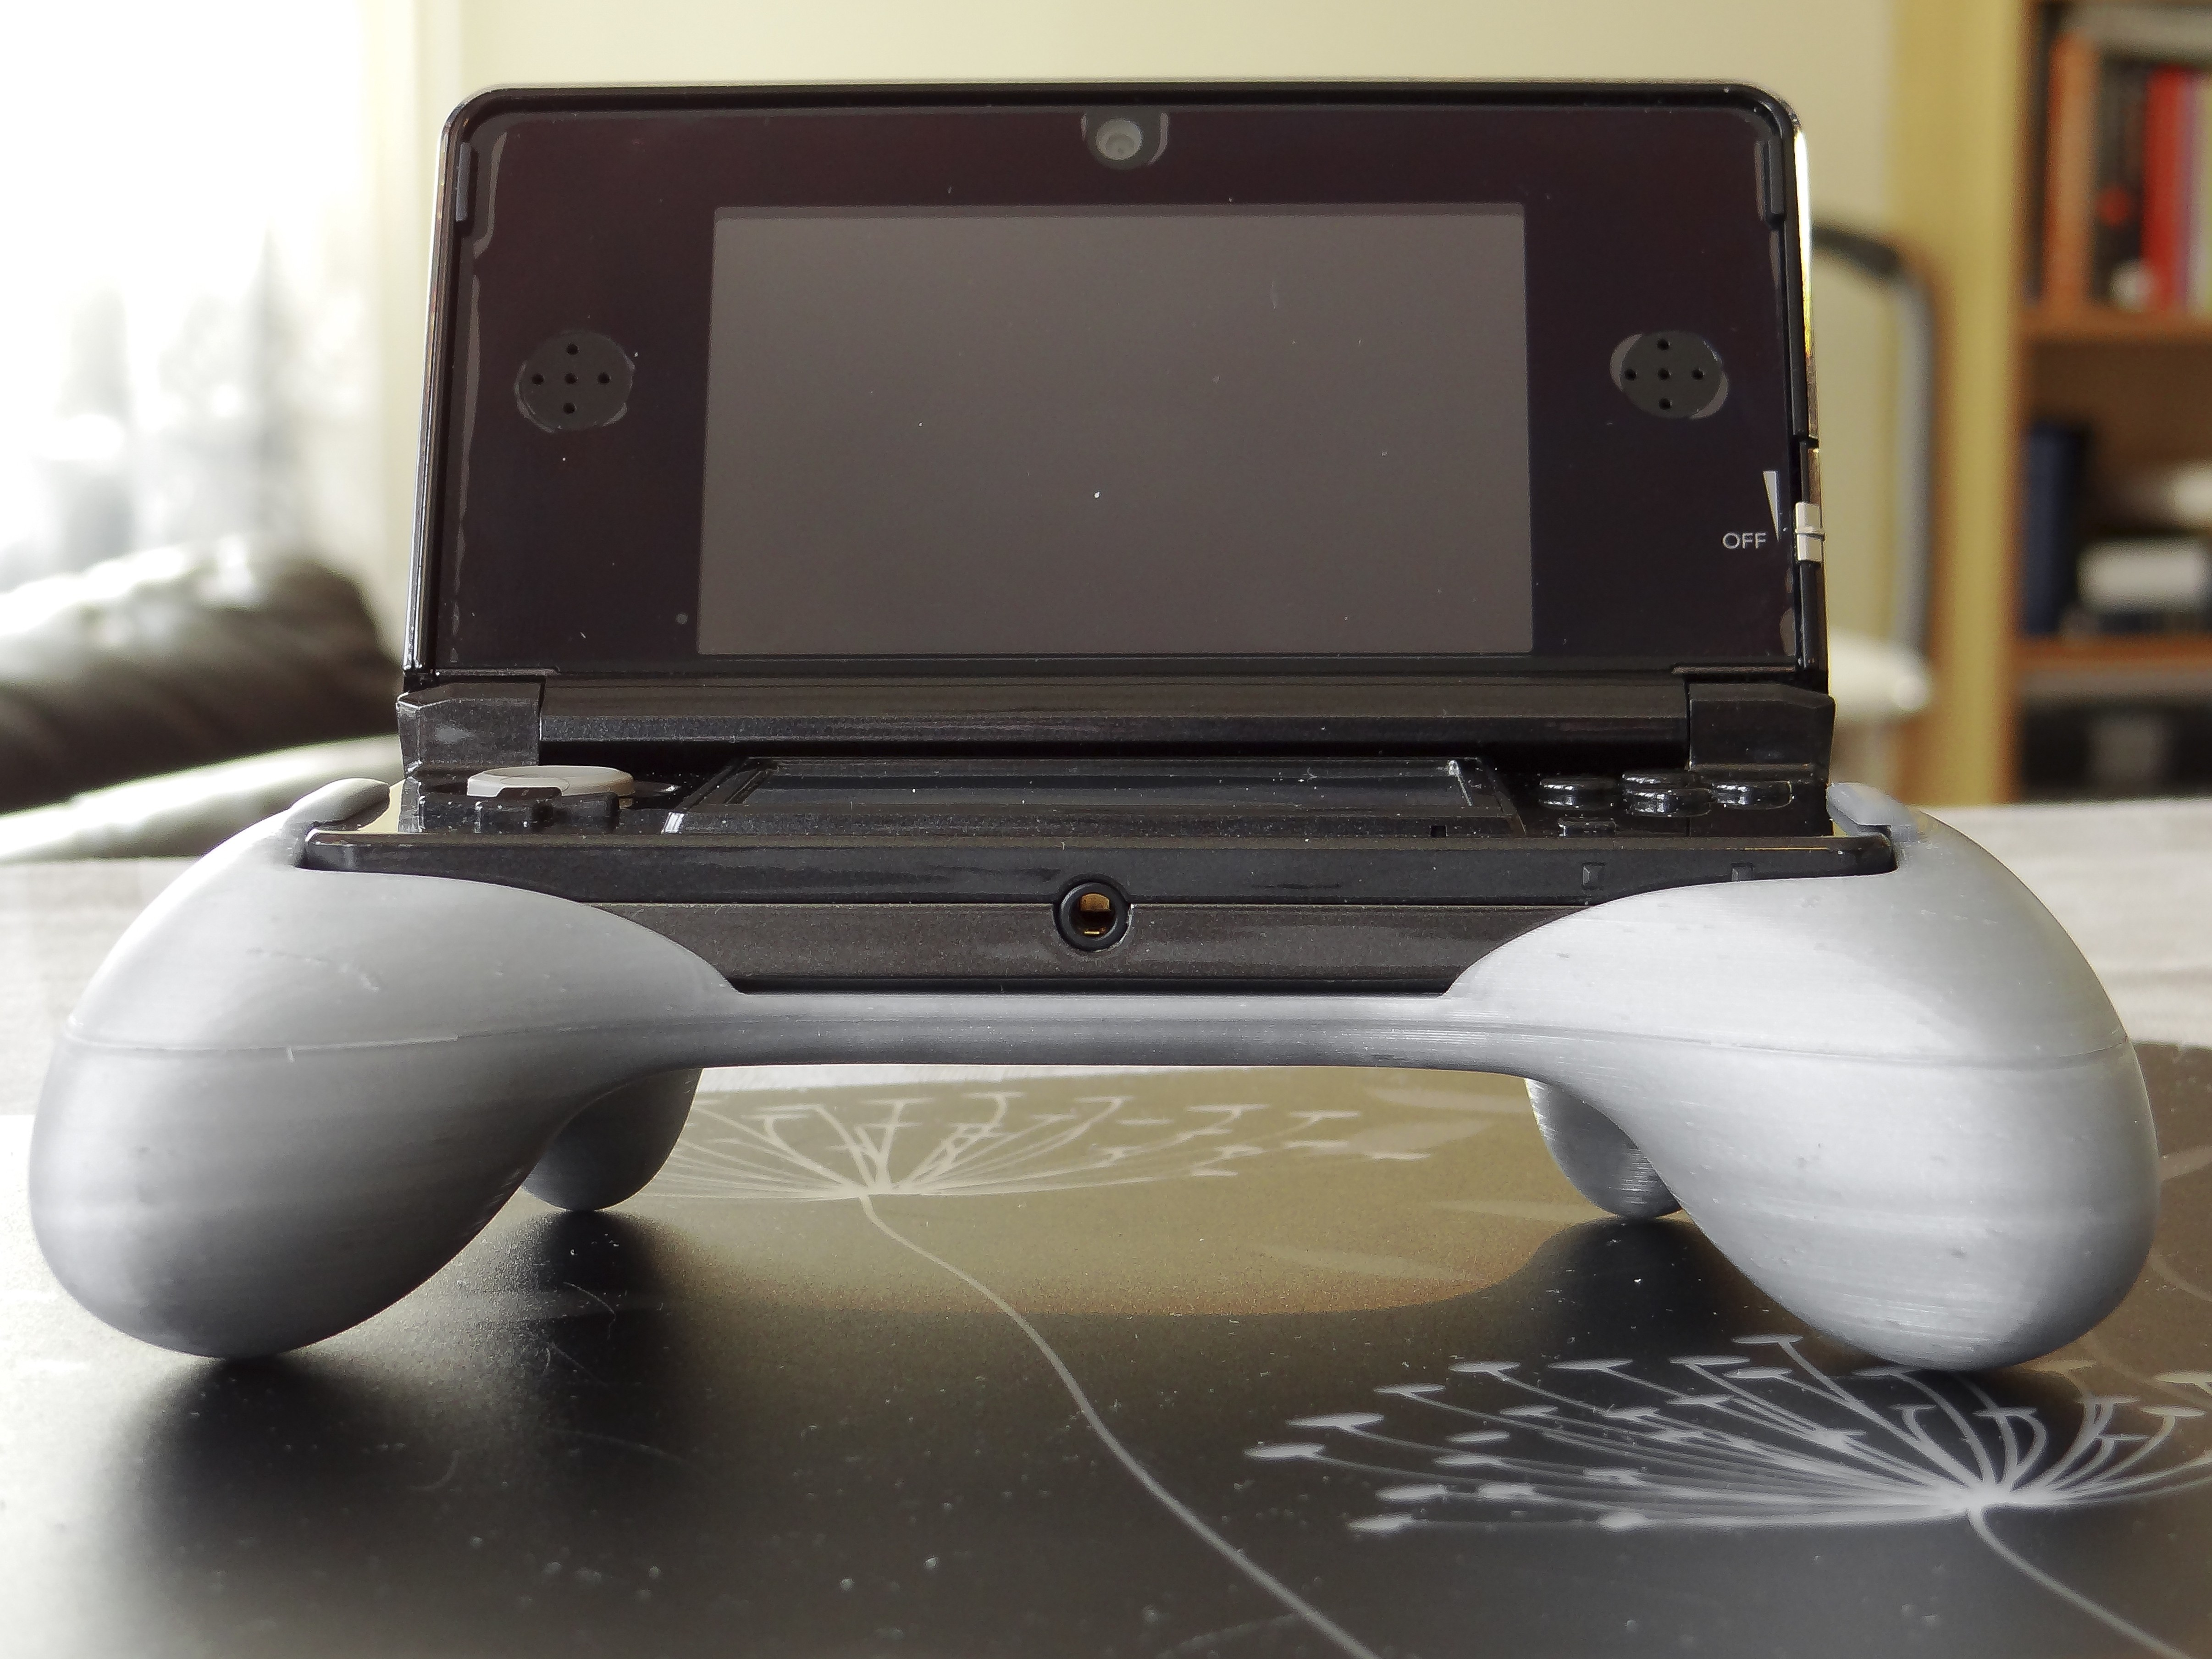 7.jpg Download free STL file Ergonomic Grip For 3DS (original 3ds) • 3D print template, 3D_Printed_Mangle